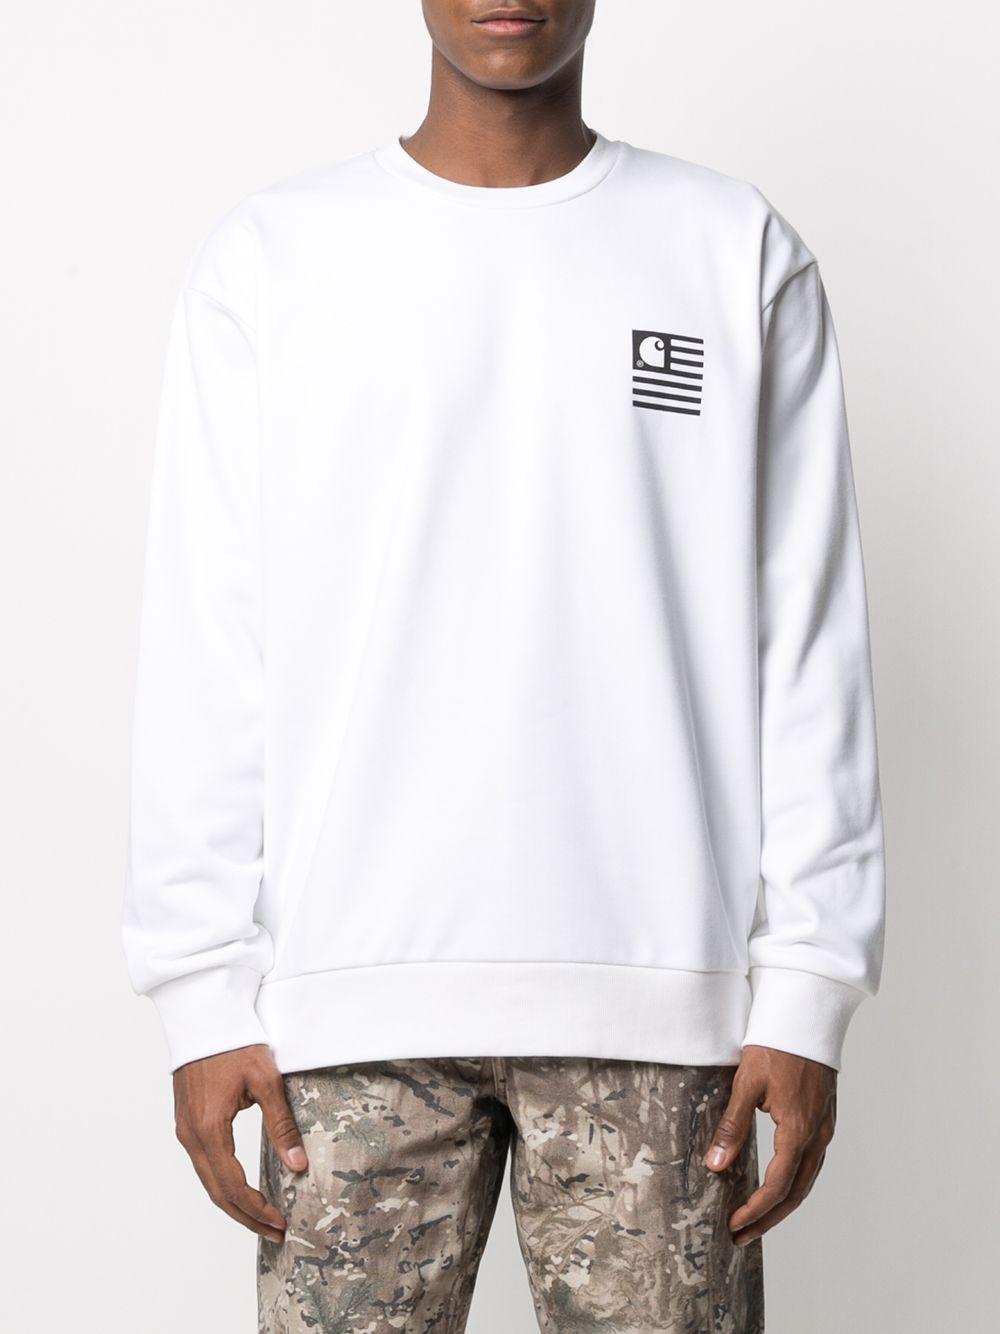 STATE CHROMO SWEATSHIRT CARHARTT WIP   Sweatshirts   I02898402.90